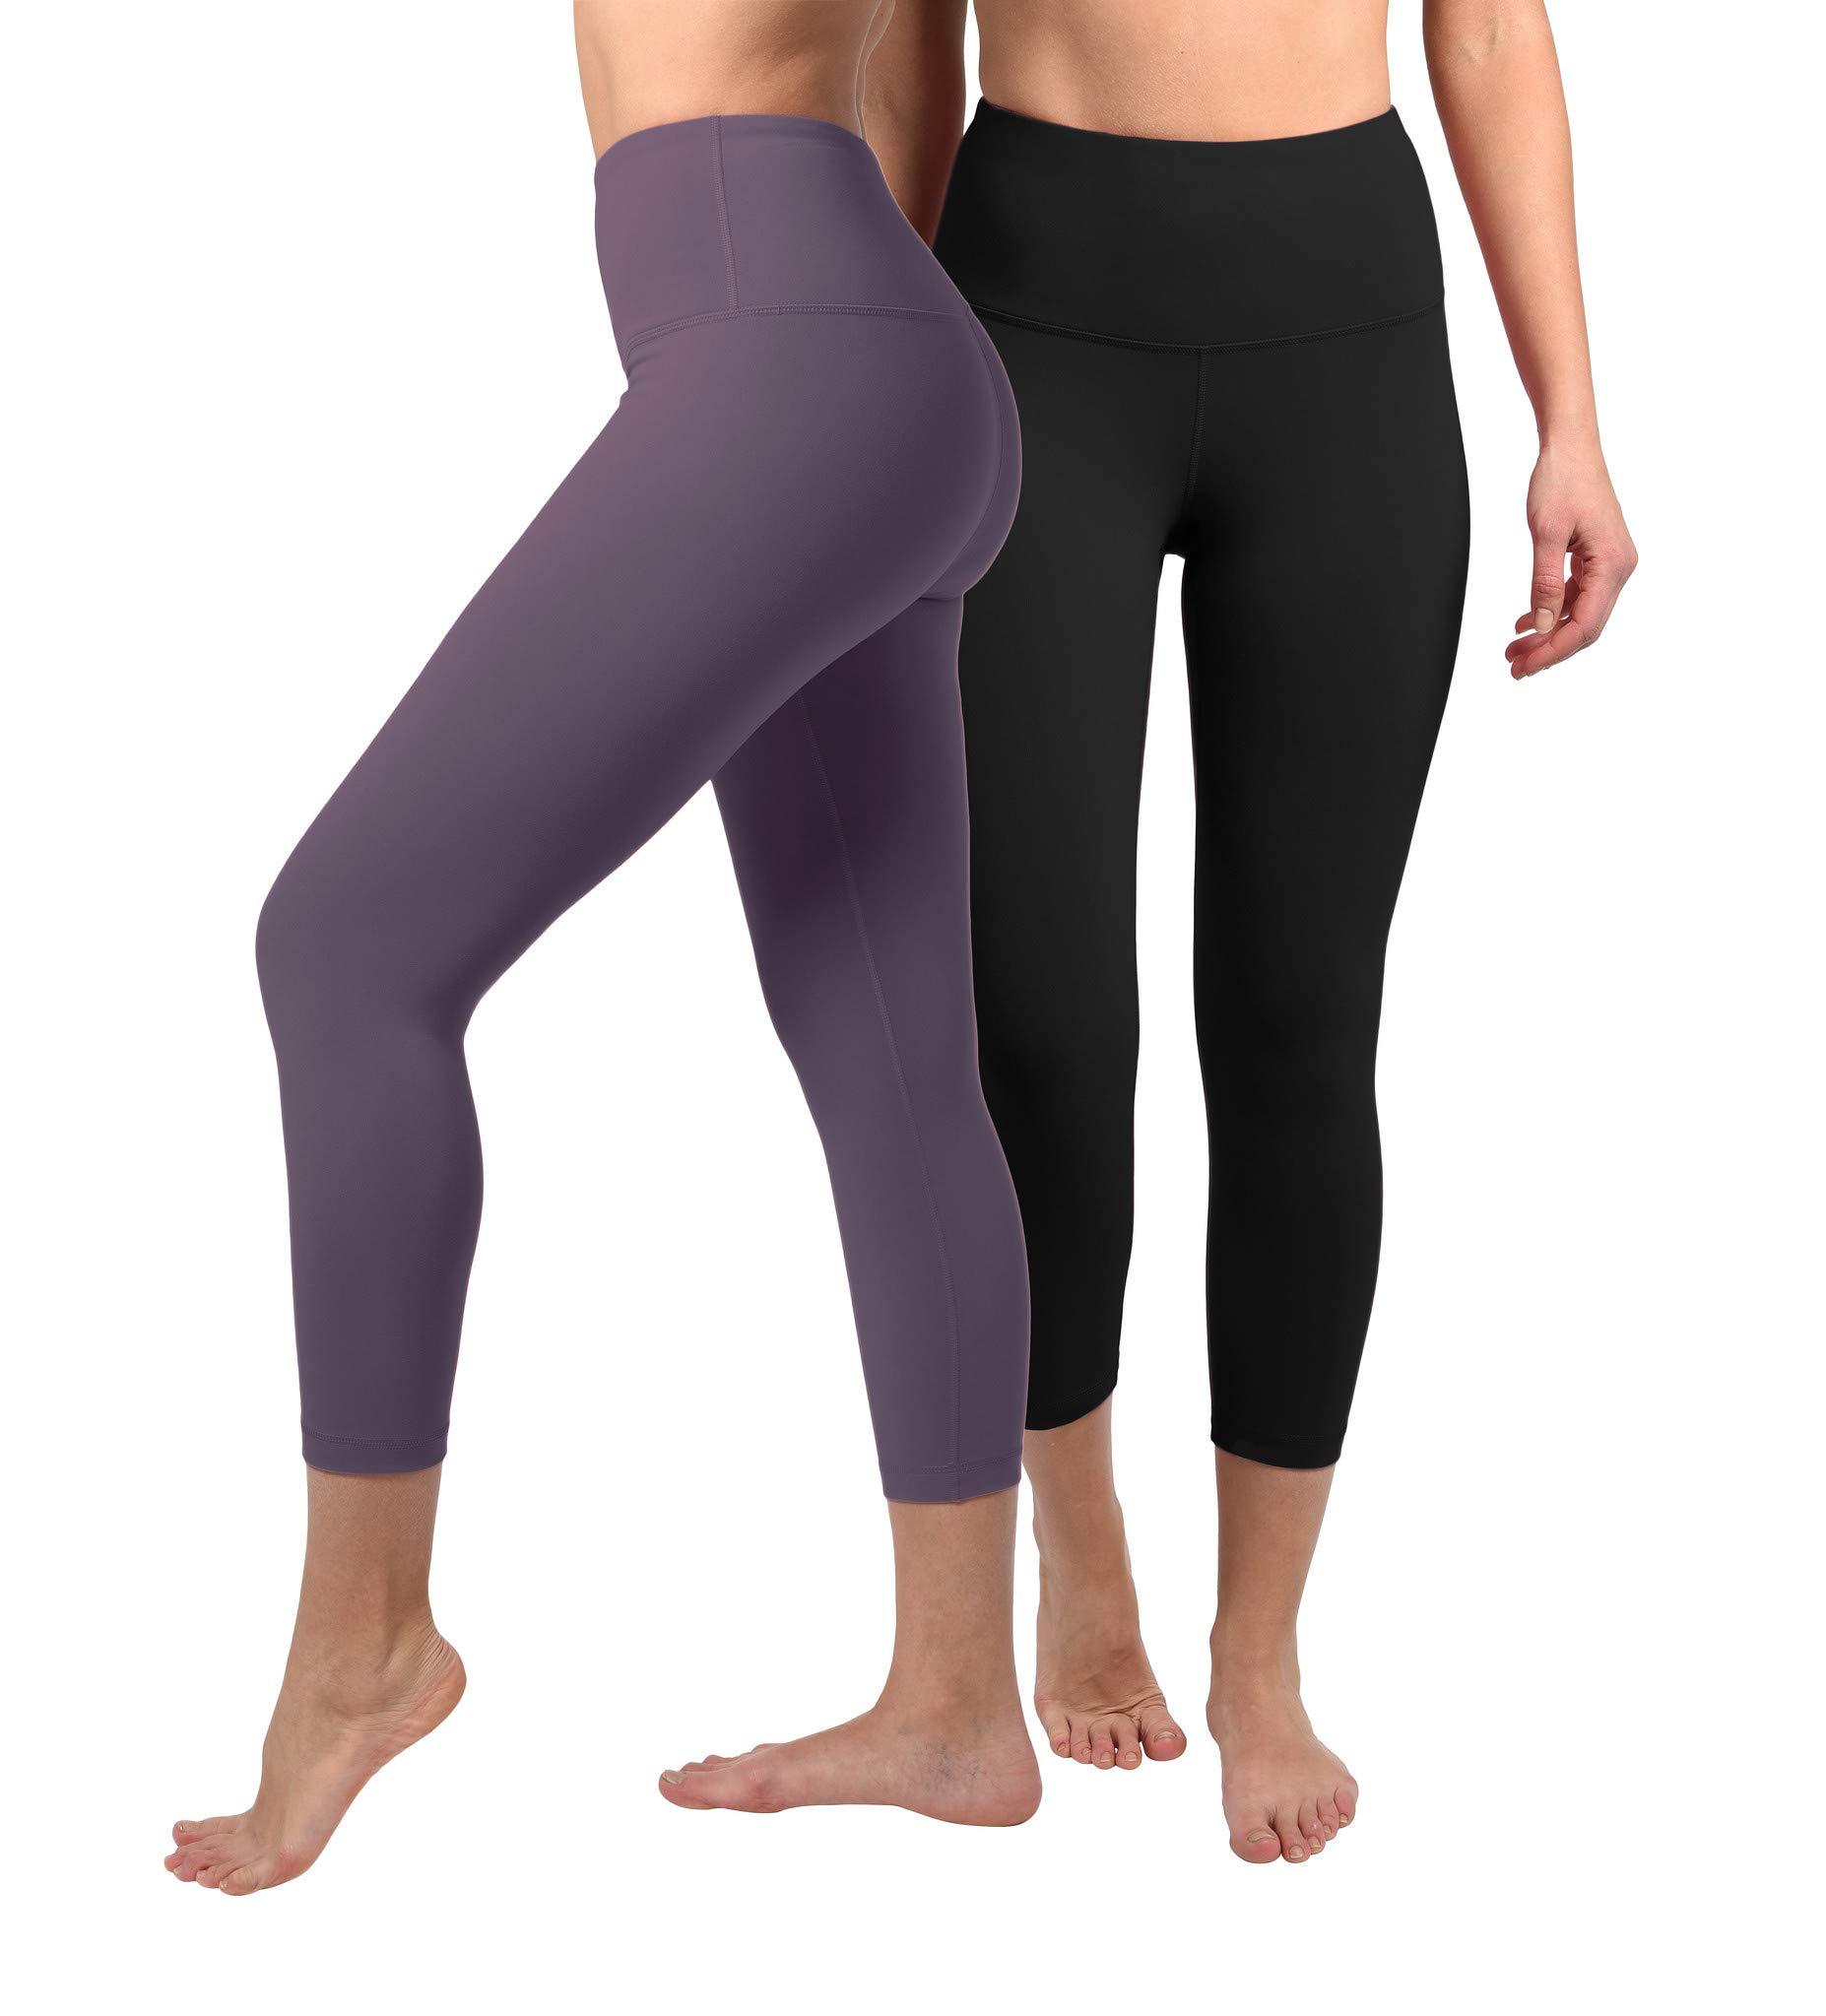 90 Degree By Reflex - High Waist Tummy Control Shapewear - Power Flex Capri - Black and Royal Plum 2 Pack - Medium